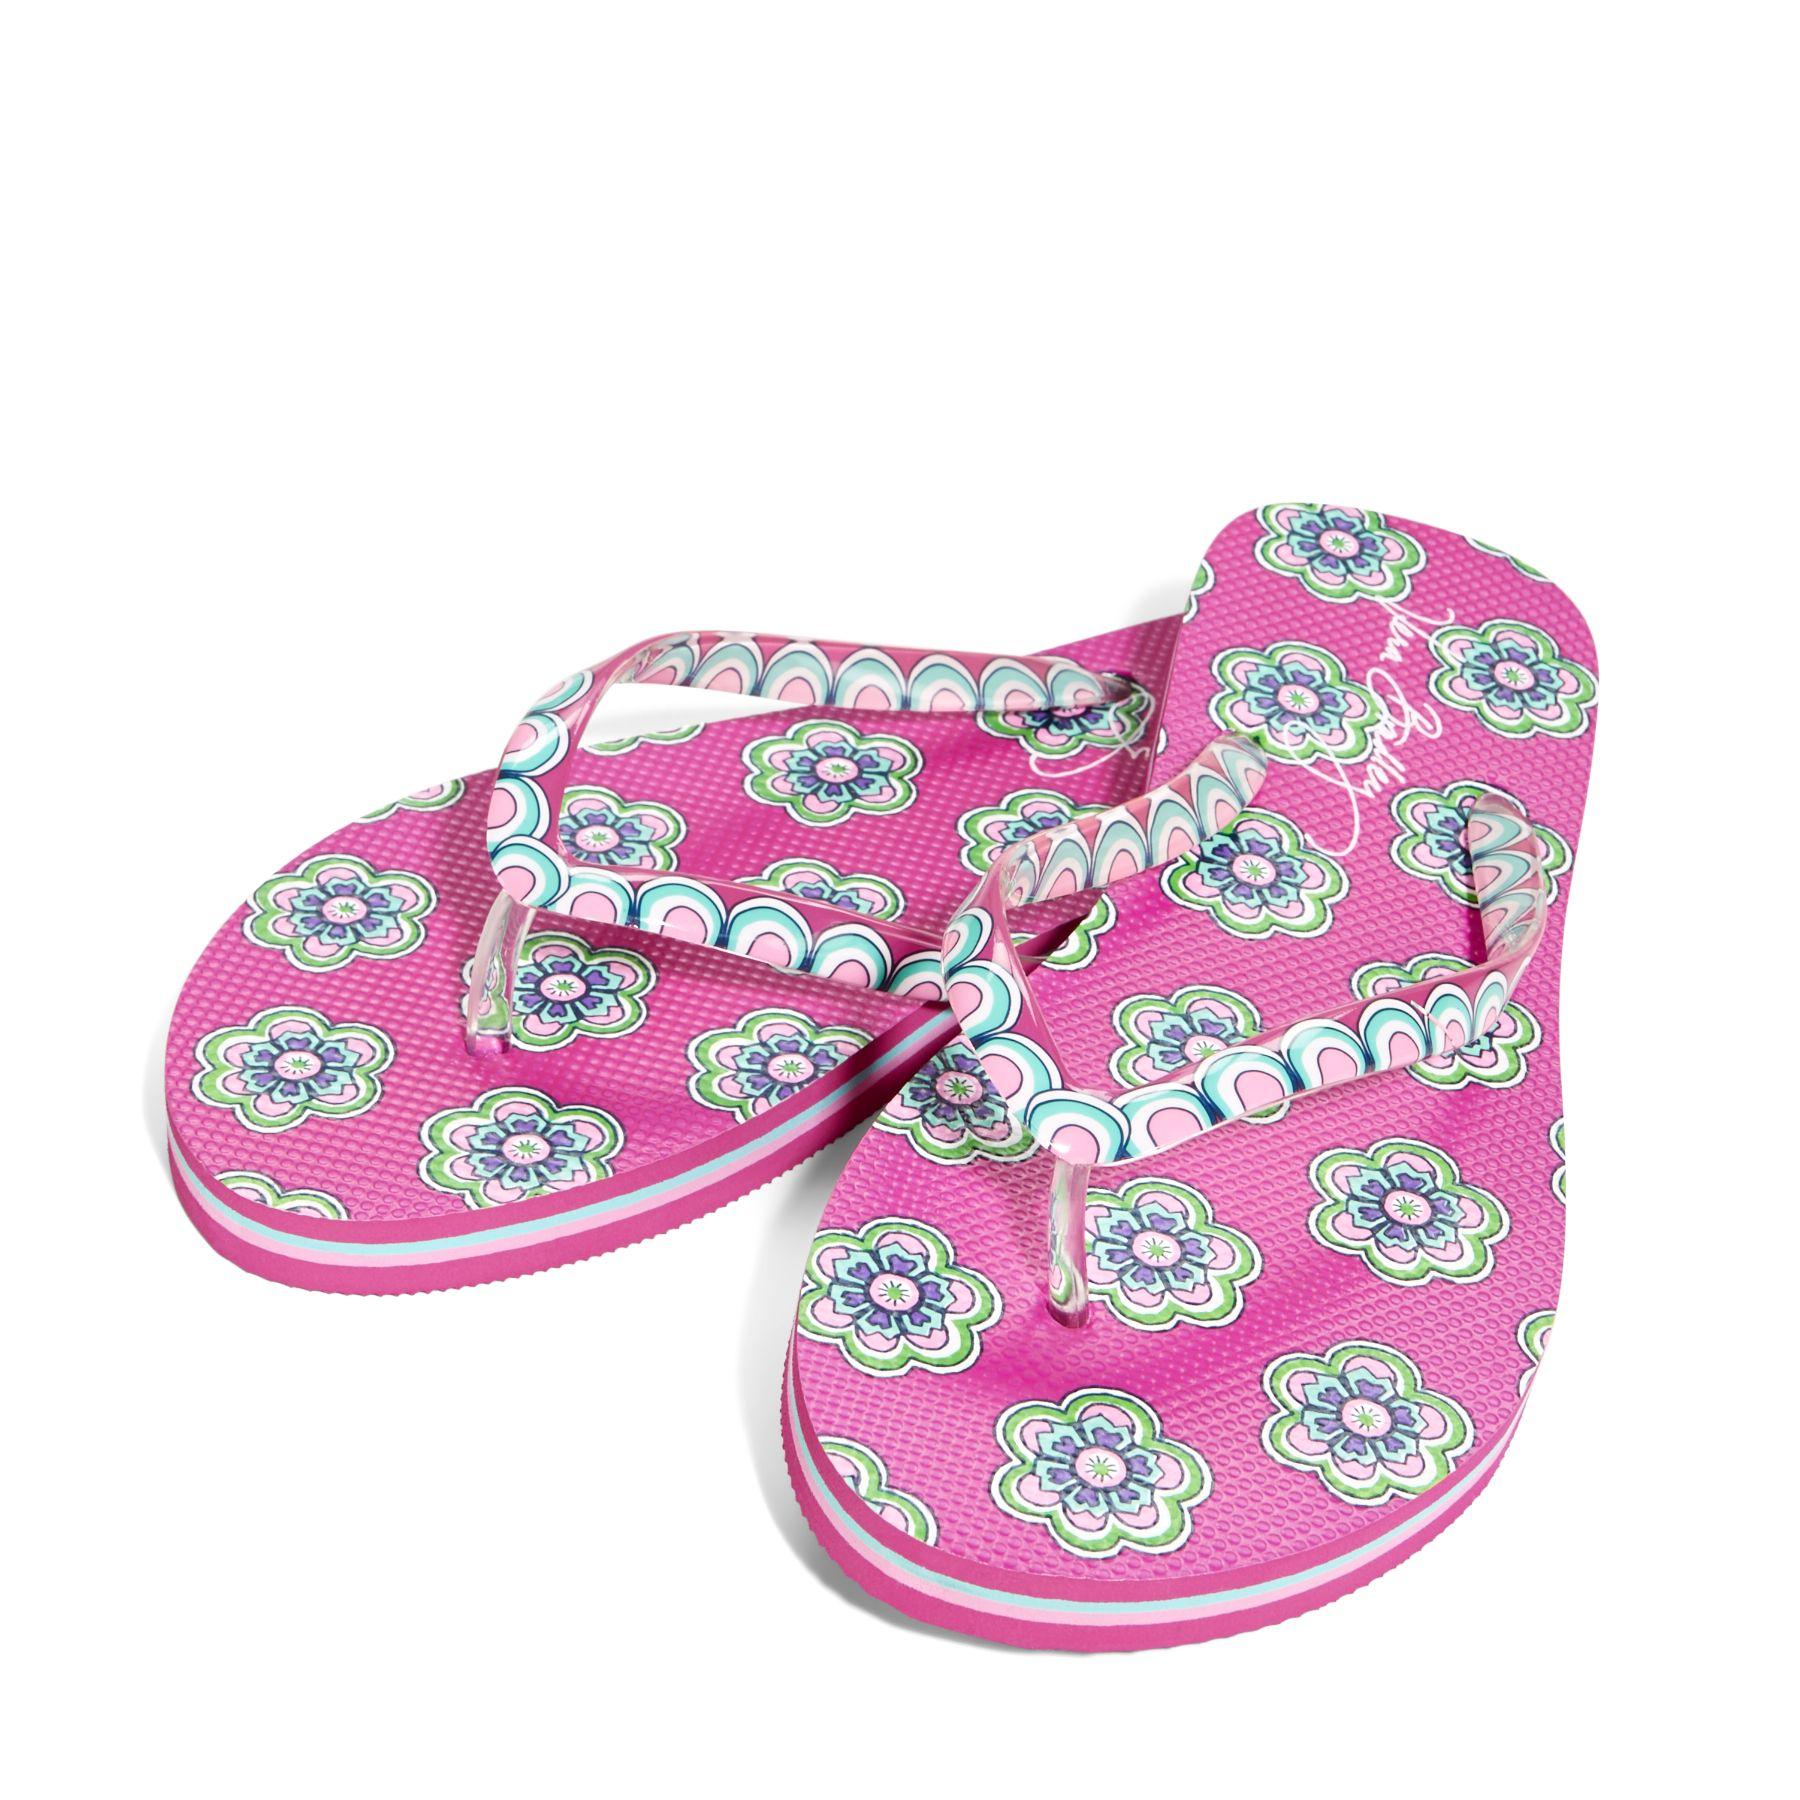 fd5d071787a9 UPC 886003293379 product image for Vera Bradley Flip Flops in Pink Swirls  Flowers